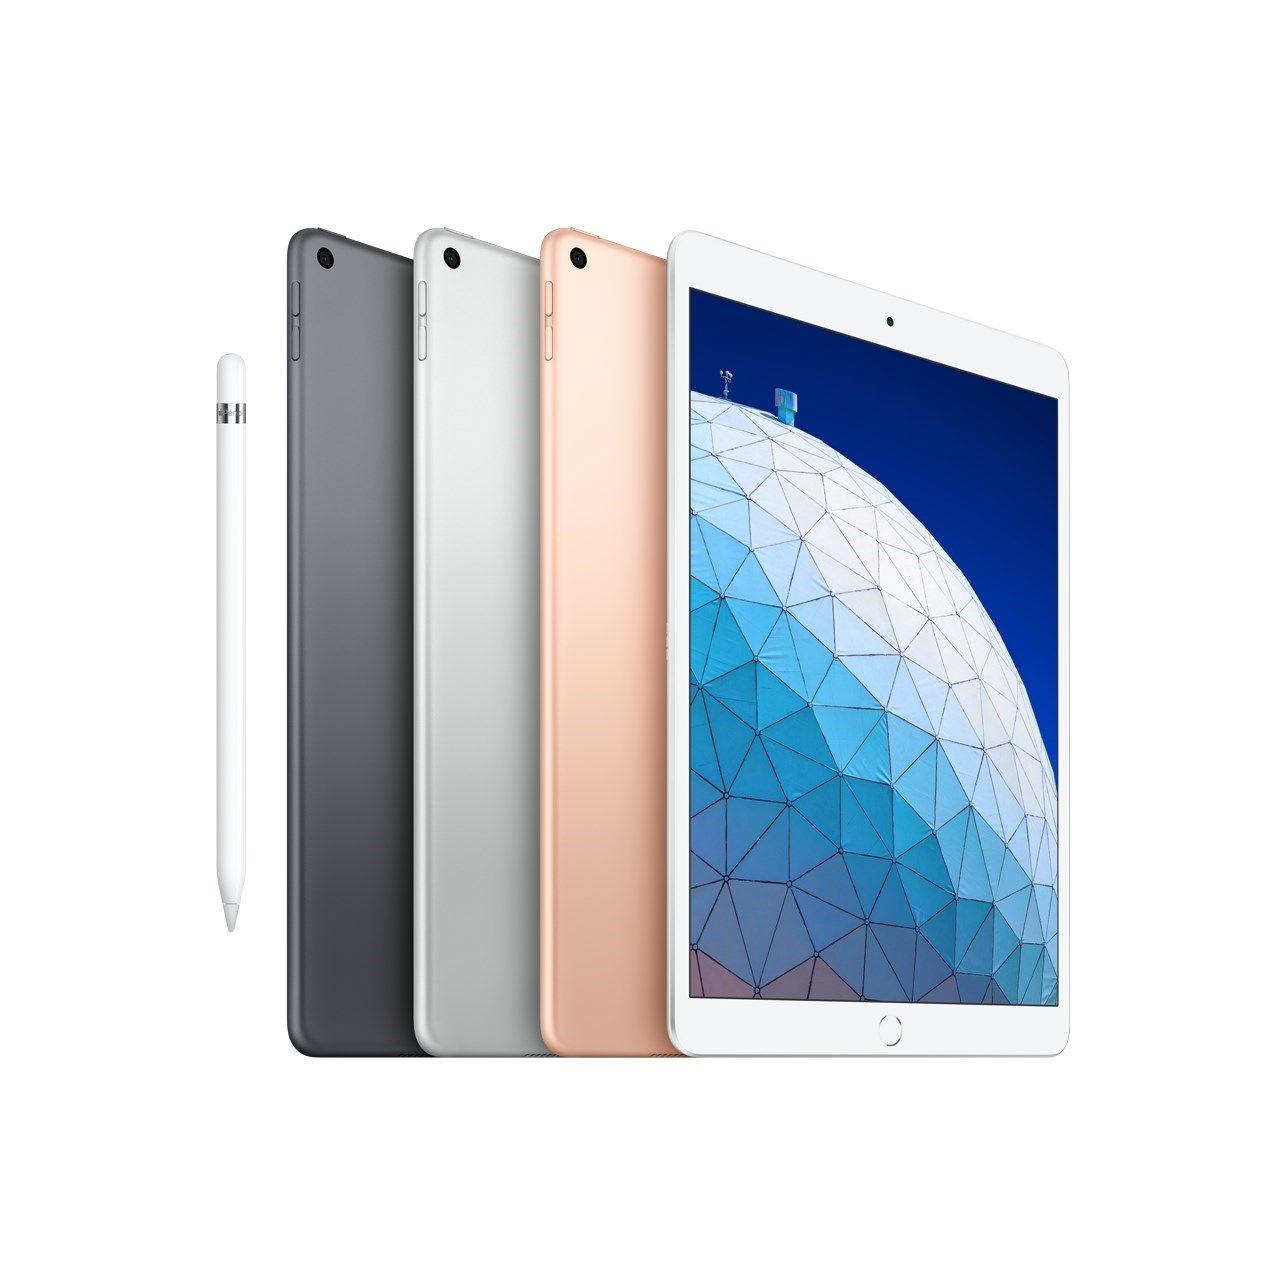 "The New and Latest iPad Air (2019) 10.5"" Retina Display"